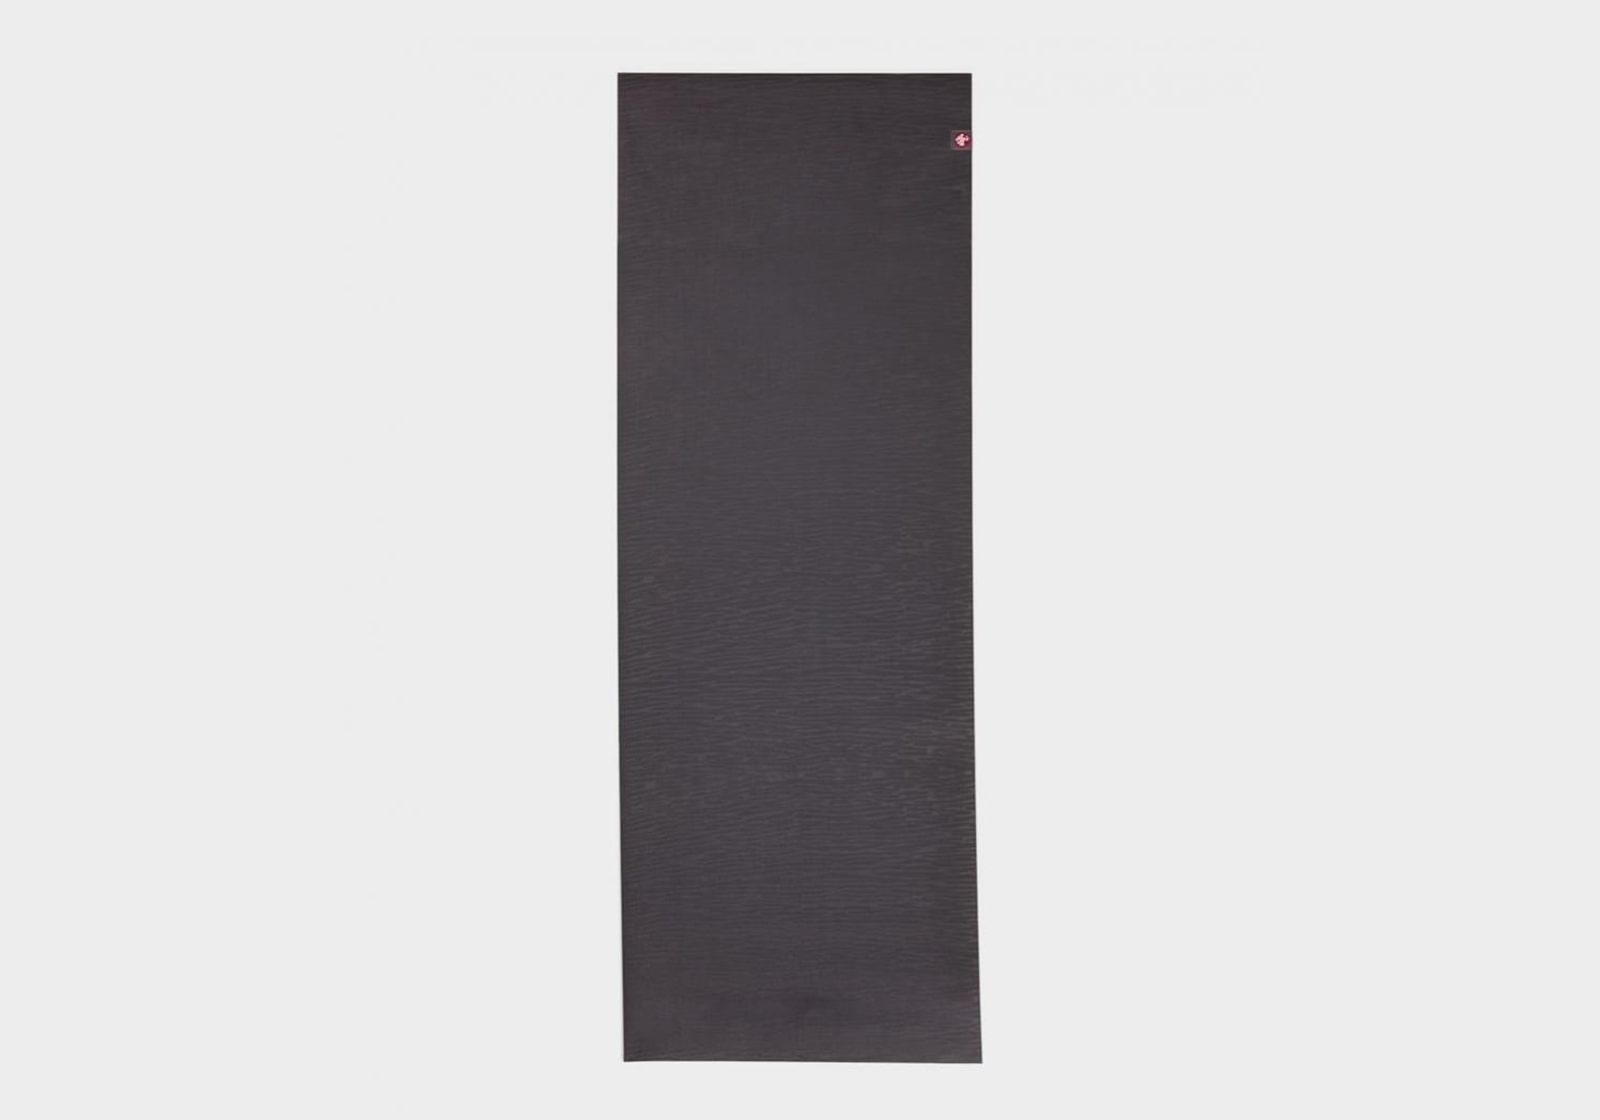 ekolite-mats-charcoal-180sm_2.jpg